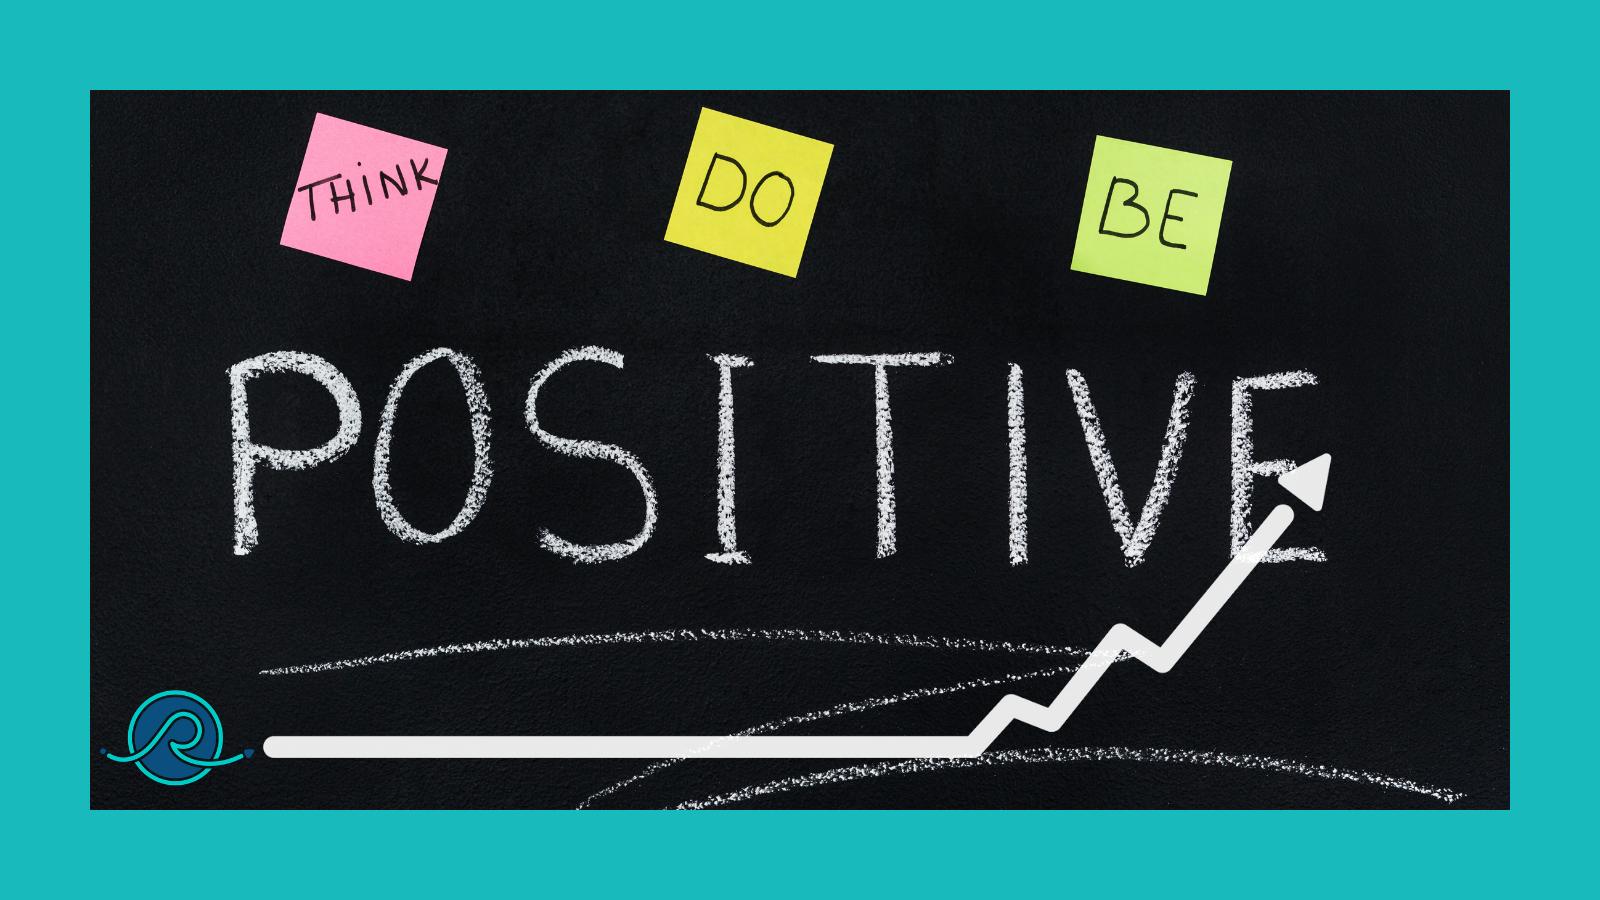 Positive Energy Wins